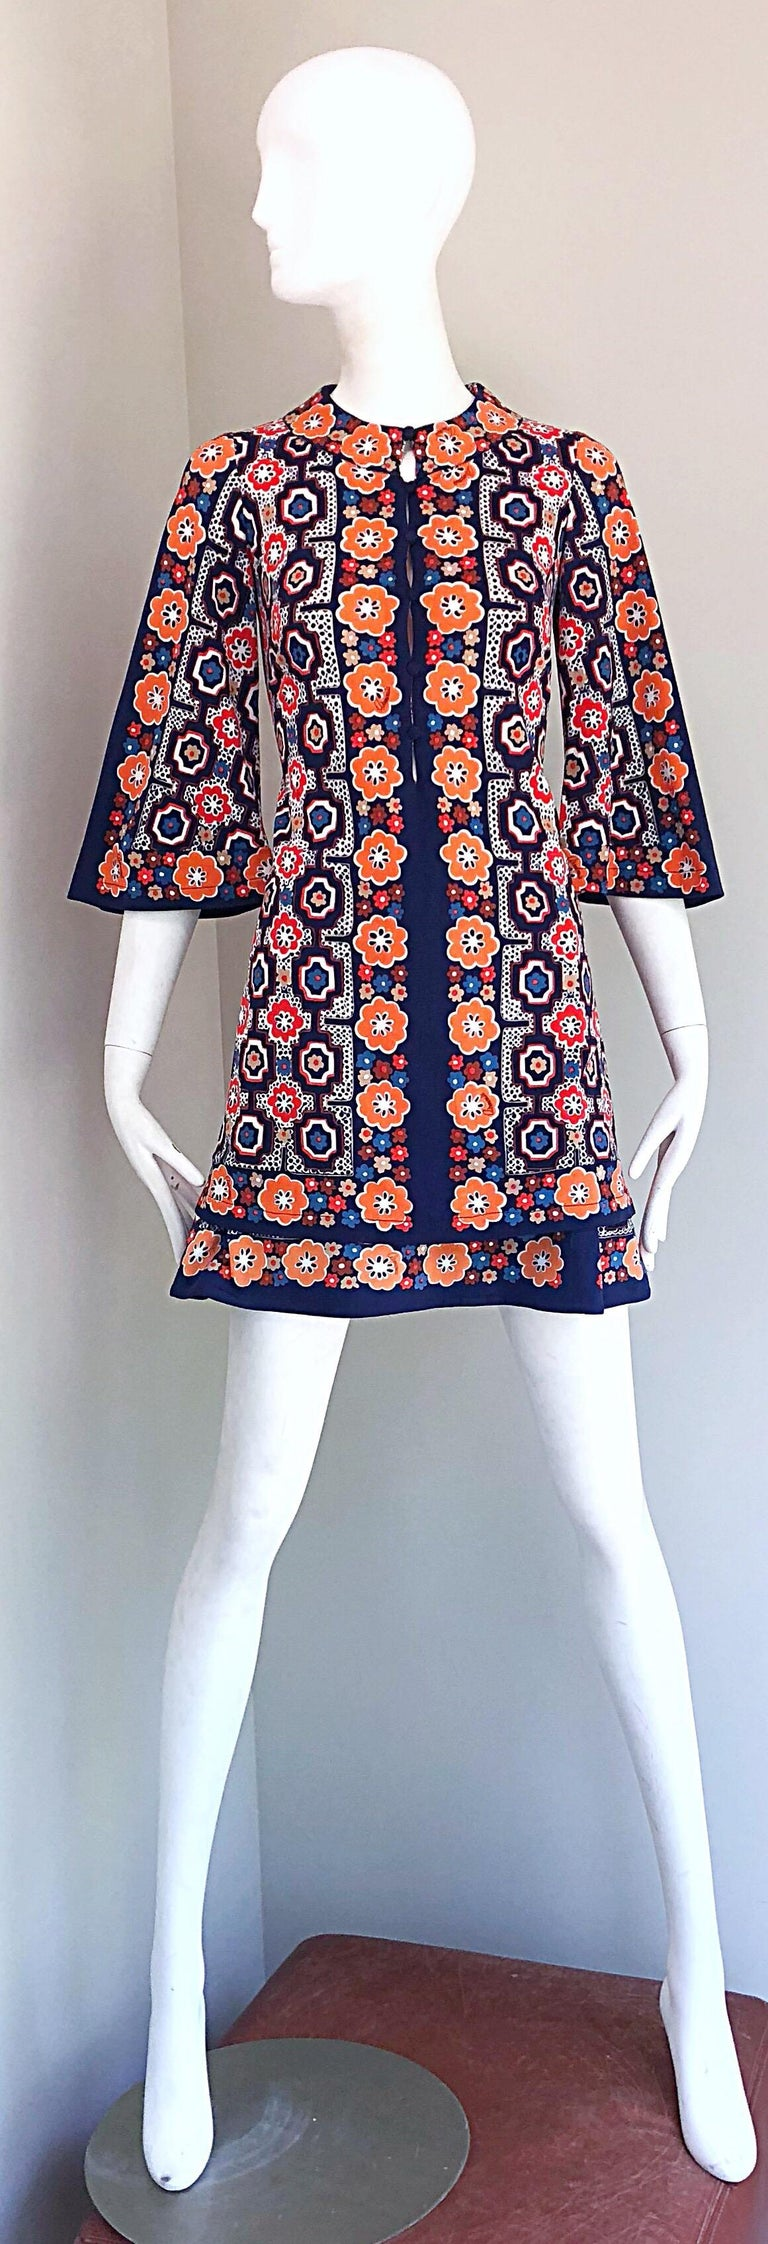 1960s Armonia Italian Jersey Bell Sleeve Vintage 60s Mod Tunic + Mini Skirt For Sale 12